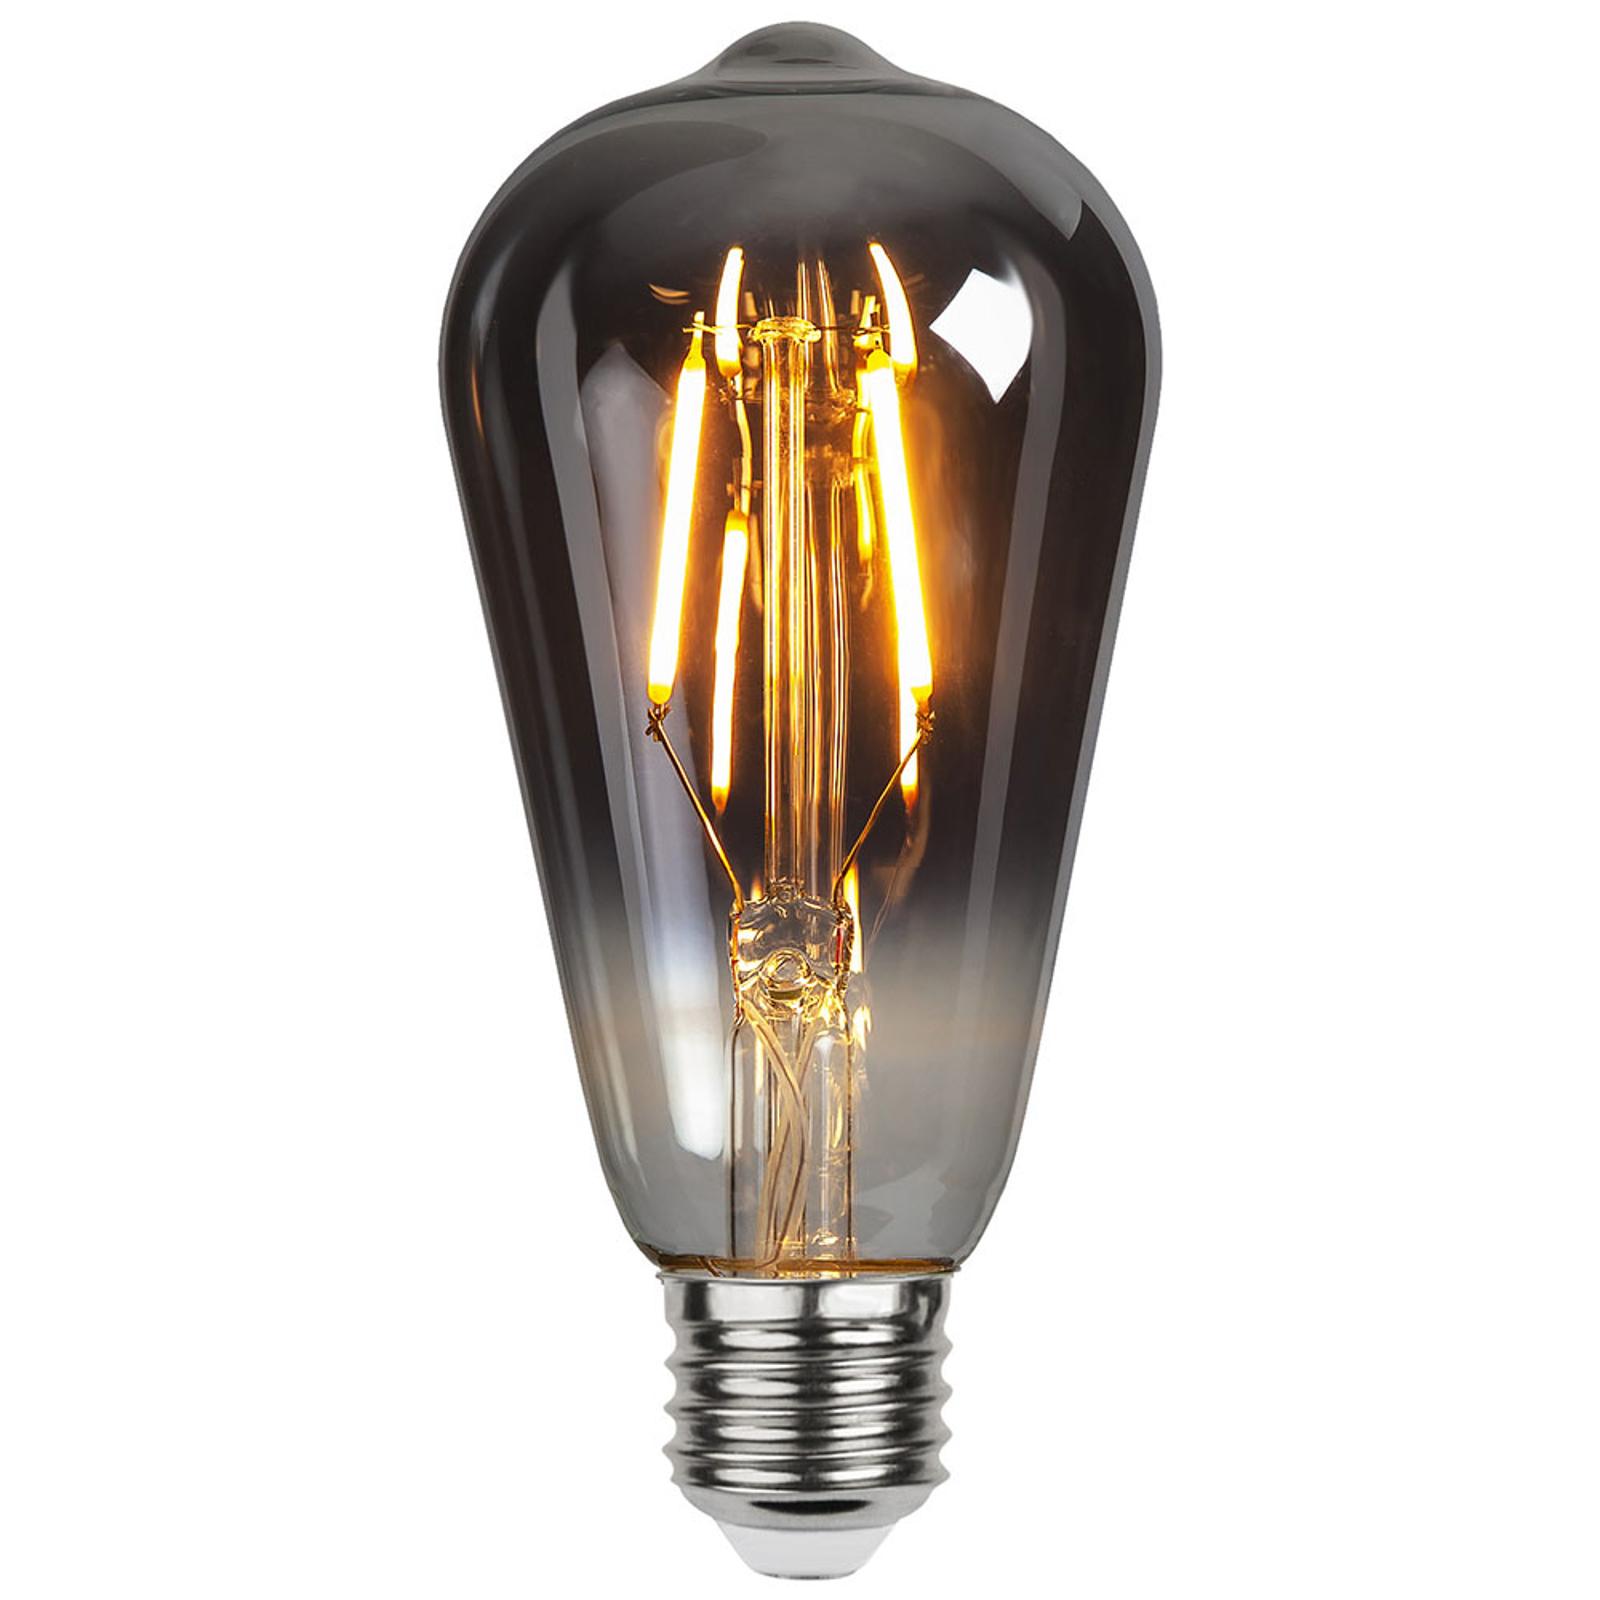 LED-Lampe E27 1,8W ST64 Plain Smoke 2.100K 80lm